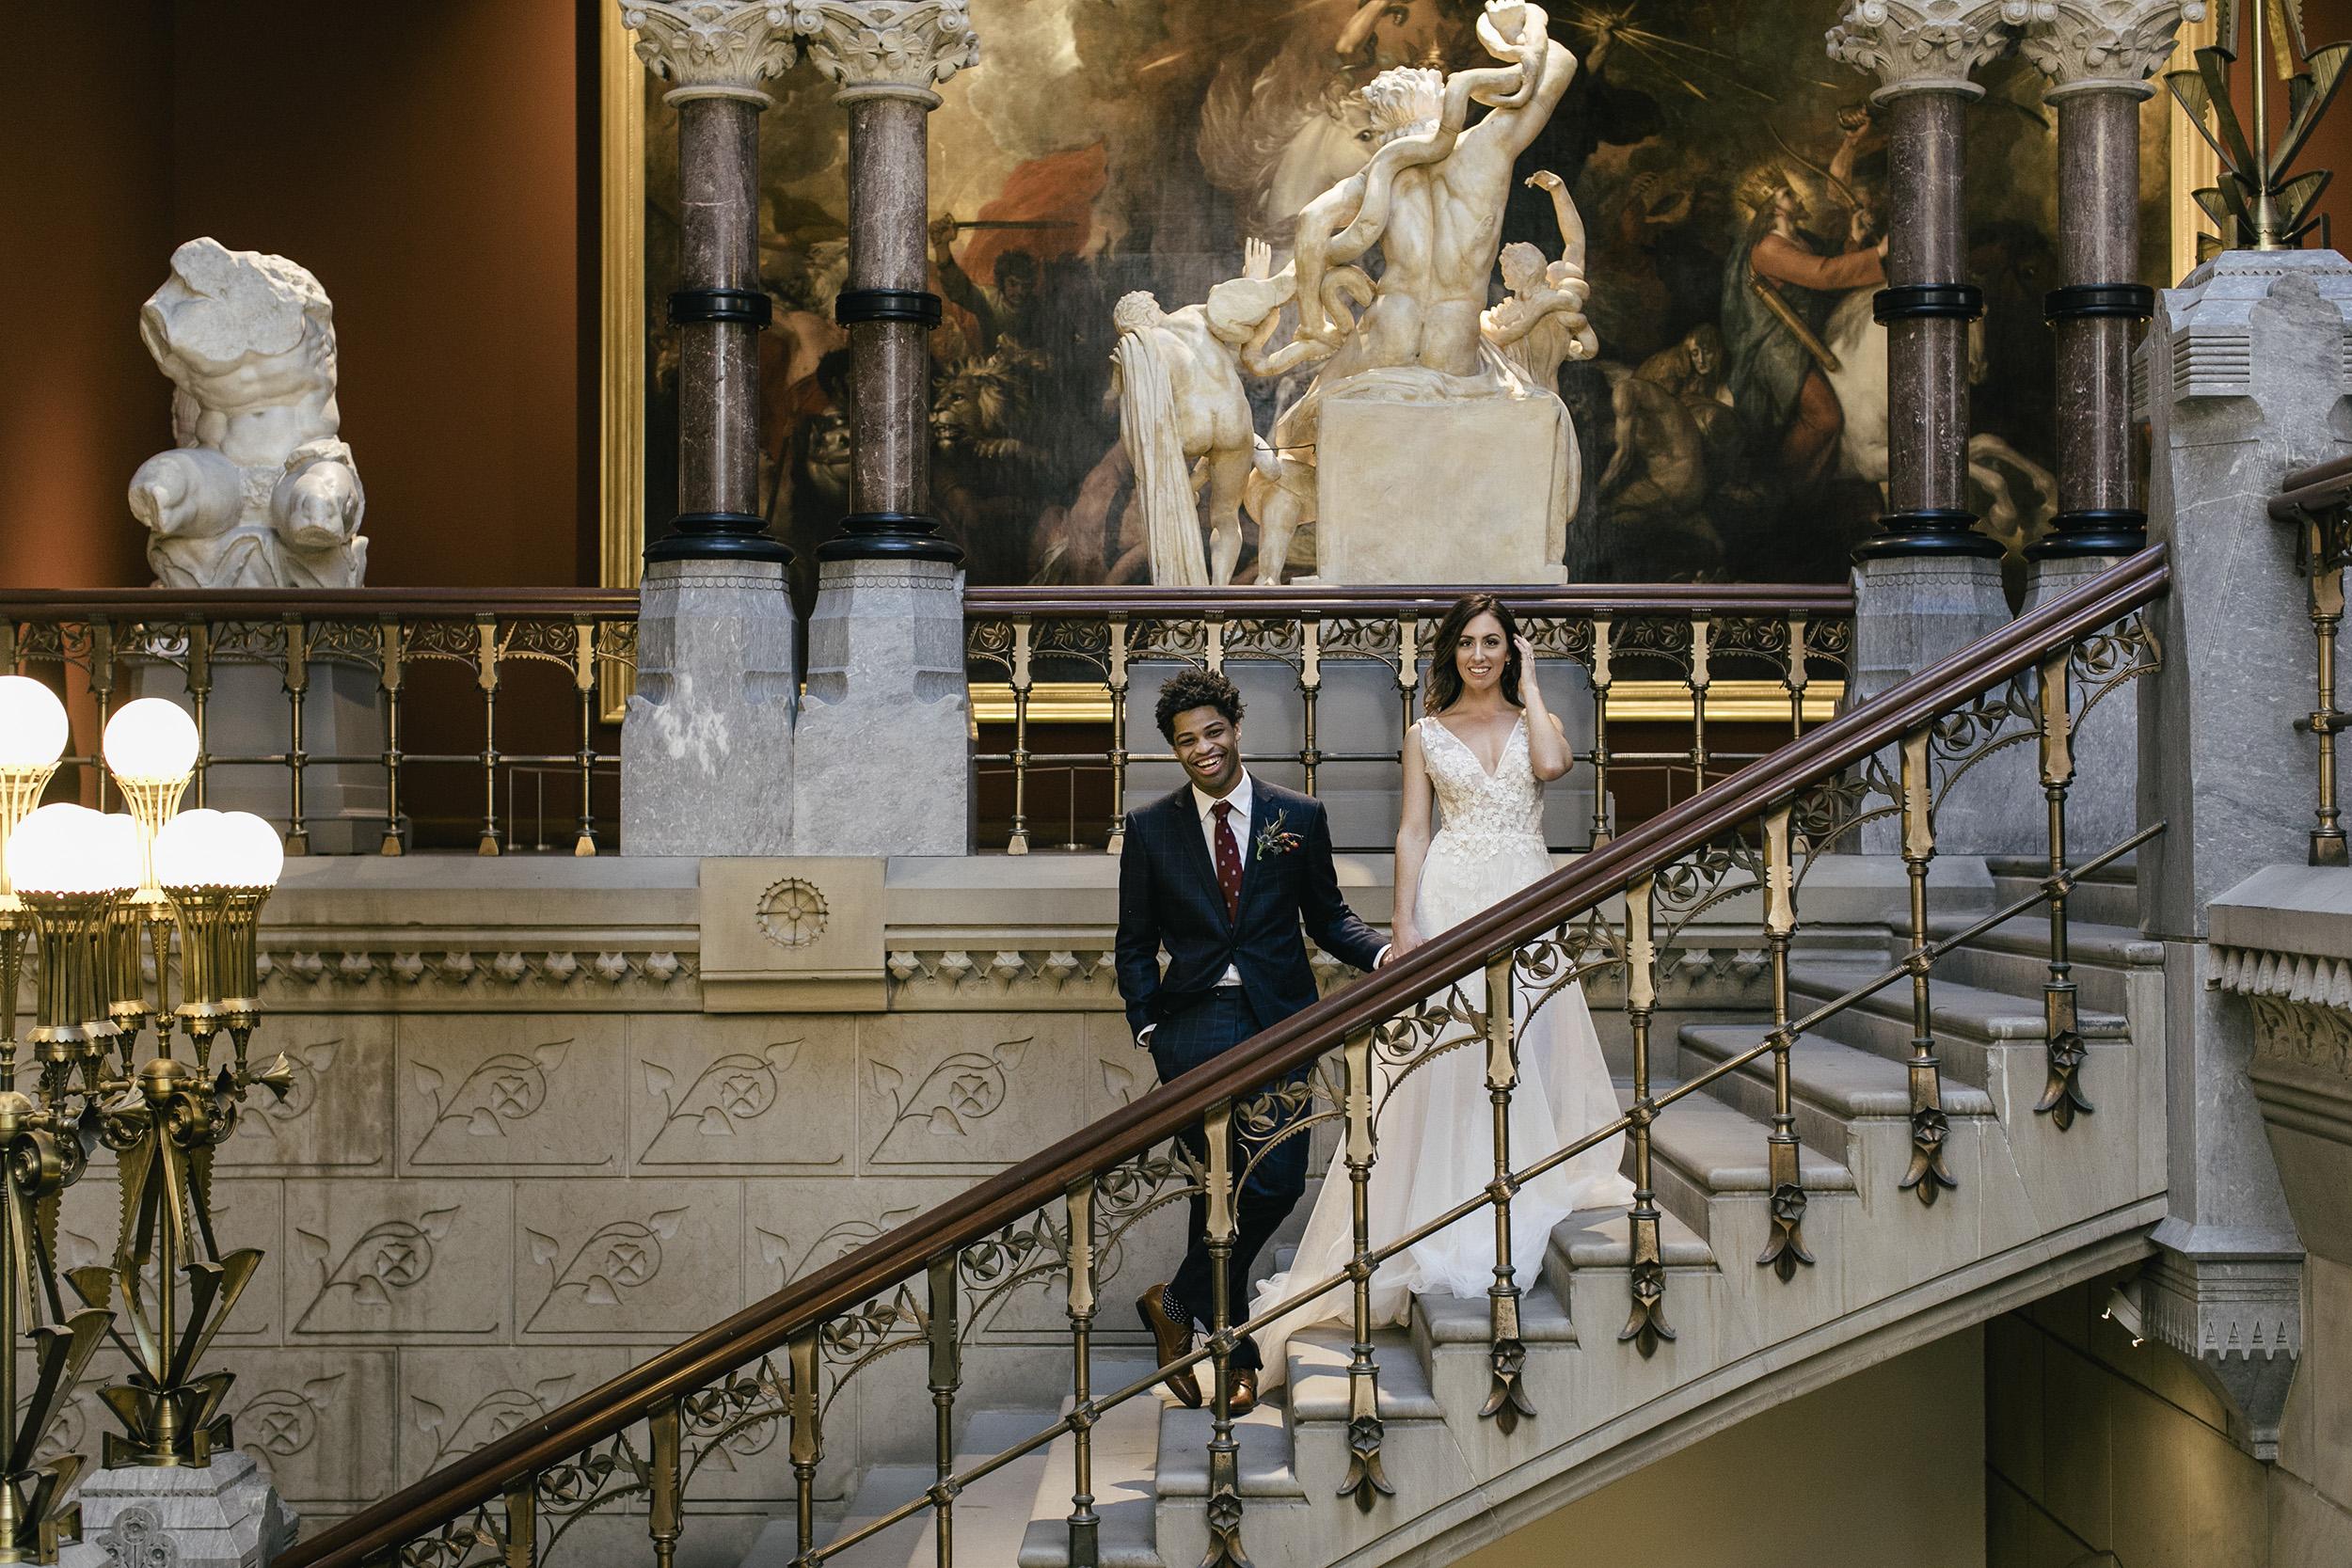 photography-wedding-weddings-natural-candid-pafa-pennsylvania academy-philadephia-philly-philadelphia wedding-mixed race-editorial-modern-fine-art-003.JPG